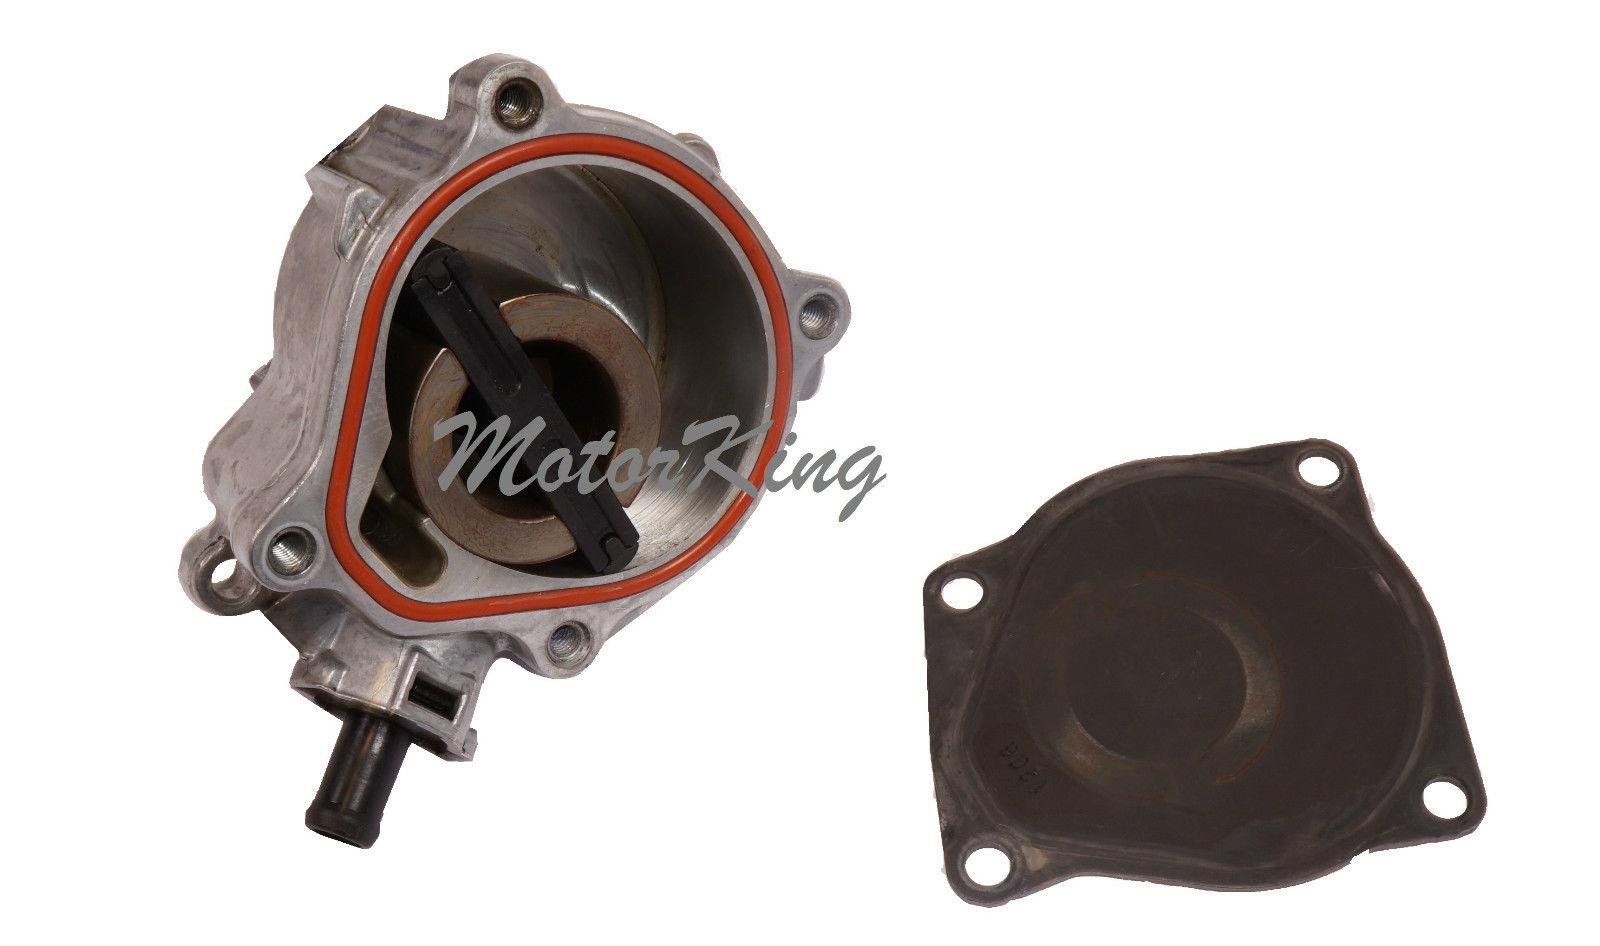 For MotorKing VW 2.5L VACUUM PUMP REBUILD SEAL KIT volkswagen gasket 07K145100C | eBay